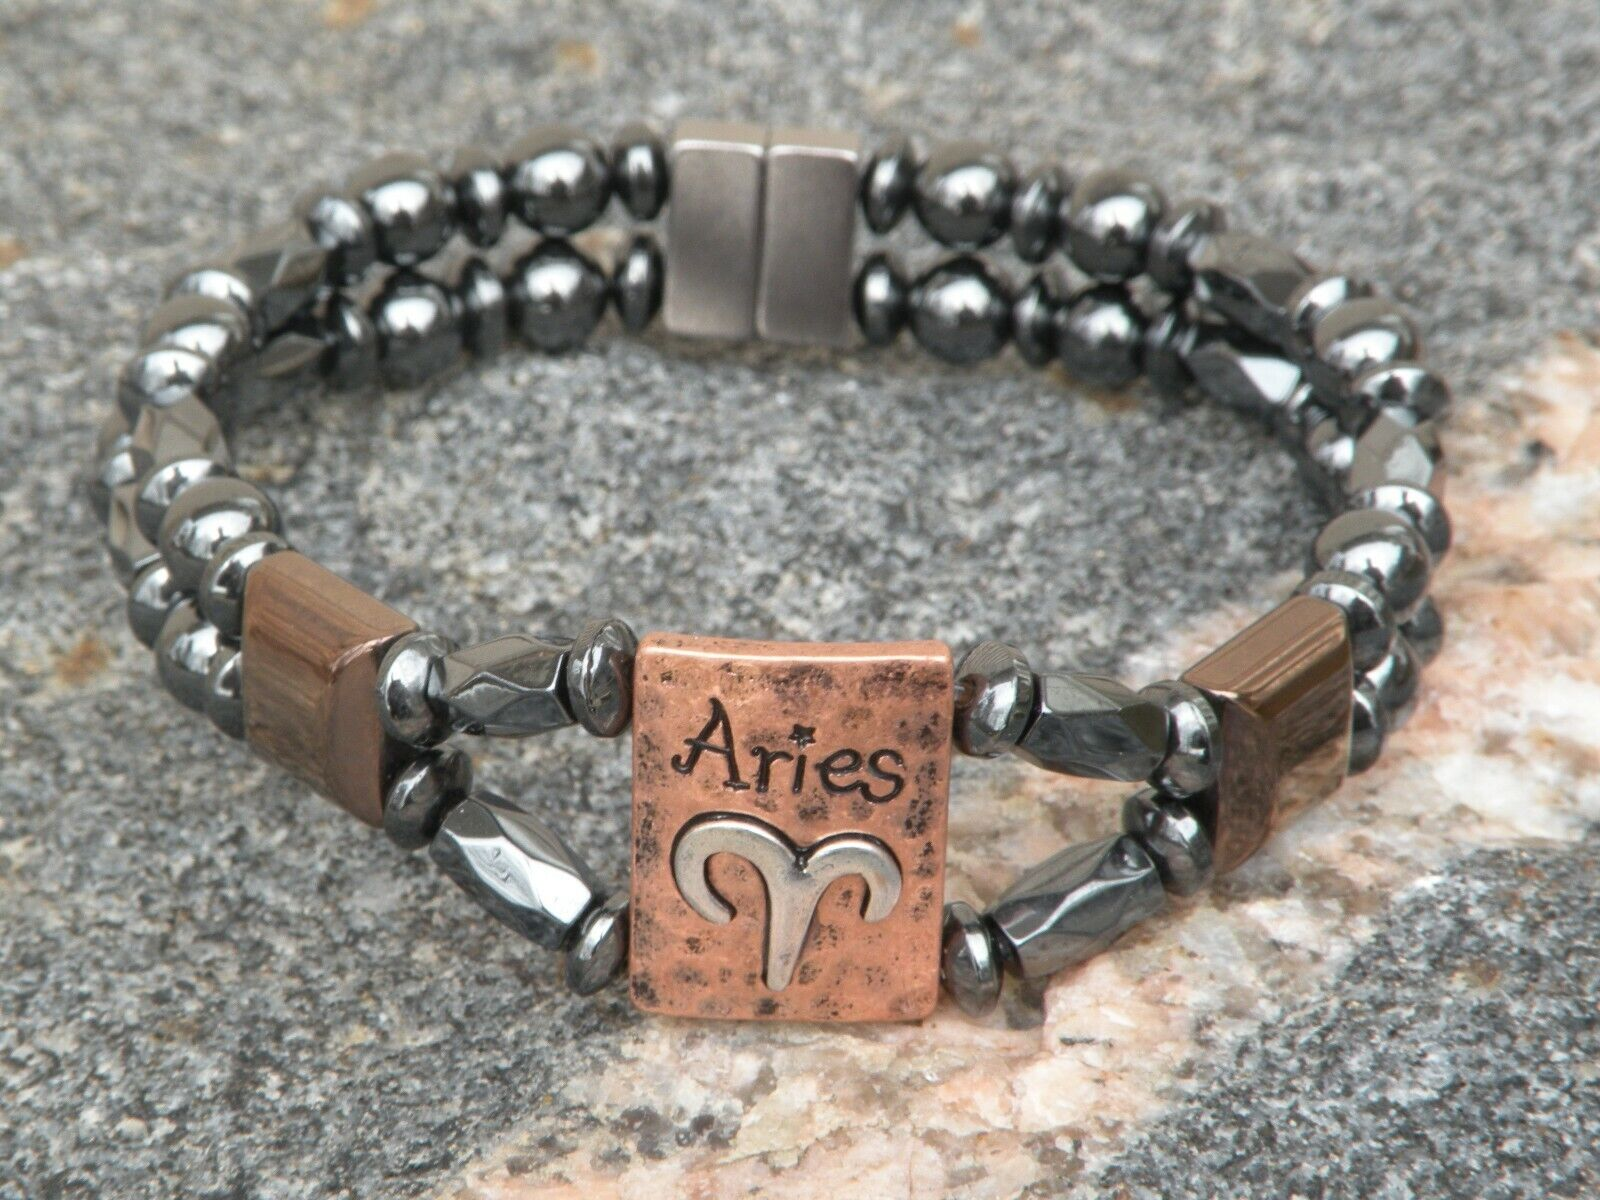 Mens Womens Aries Magnetic Hematite Bracelet Anklet 2 Row Zodiac Mar 21-April 19